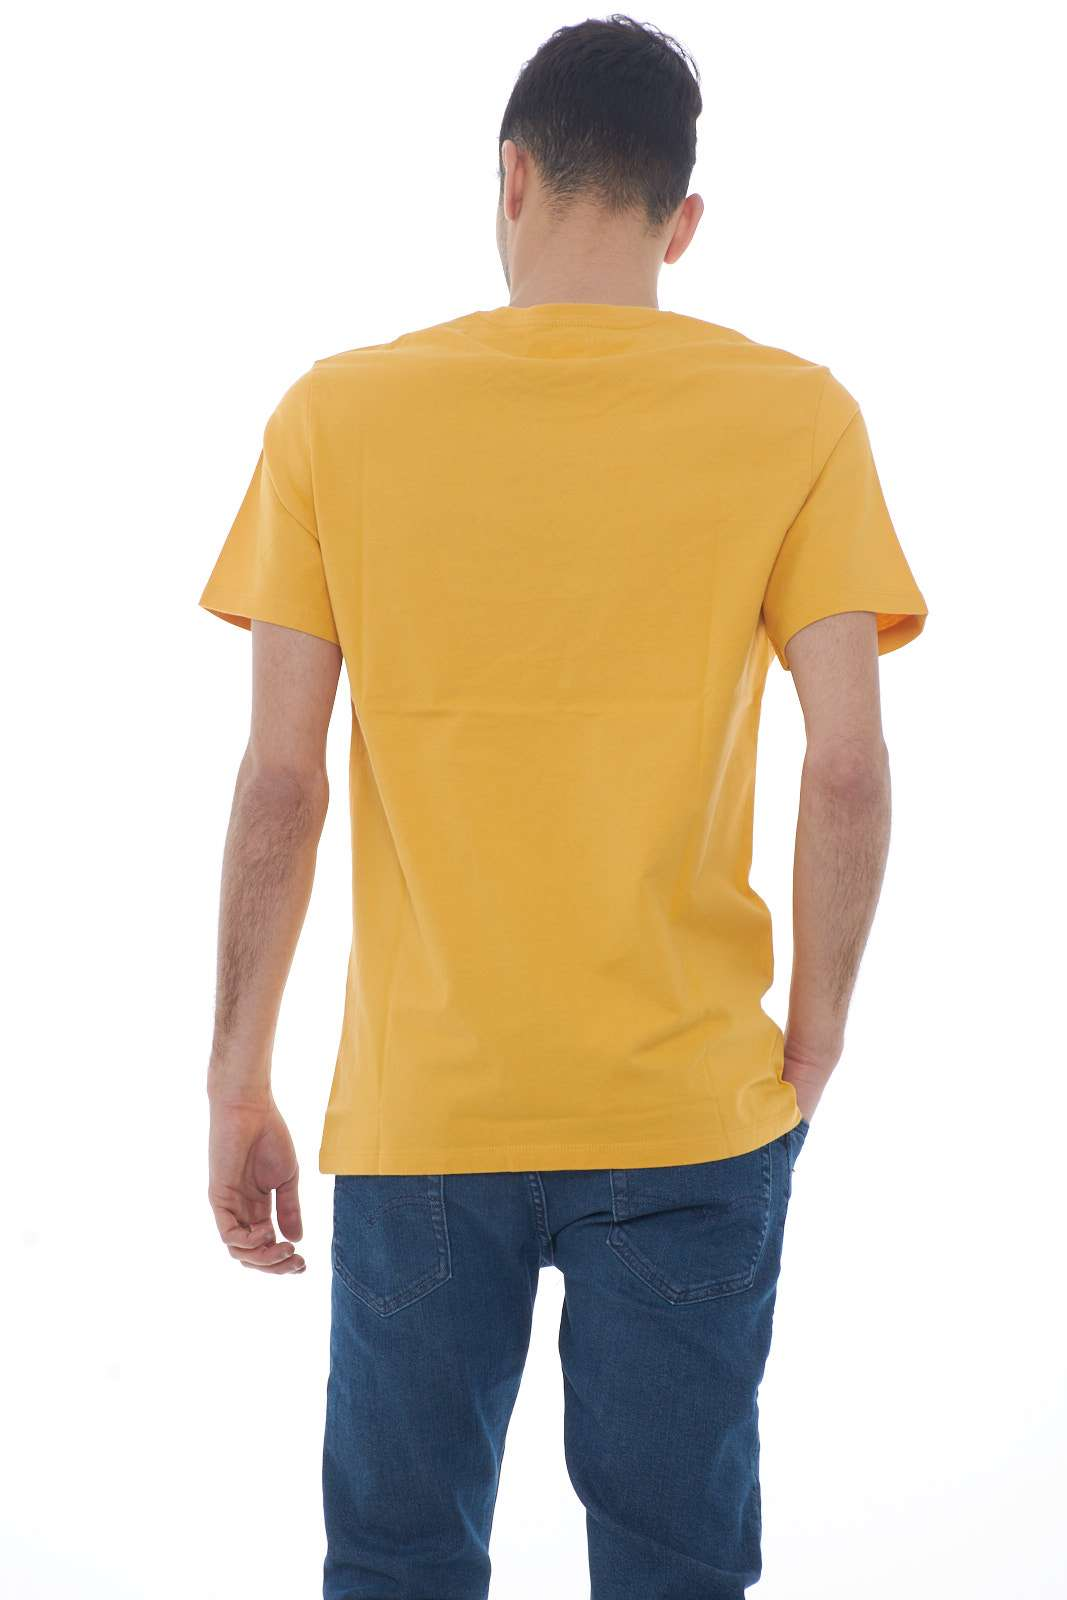 https://www.parmax.com/media/catalog/product/a/i/PE-outlet_parmax-t-shirt-uomo-Levis-171640003-C.jpg